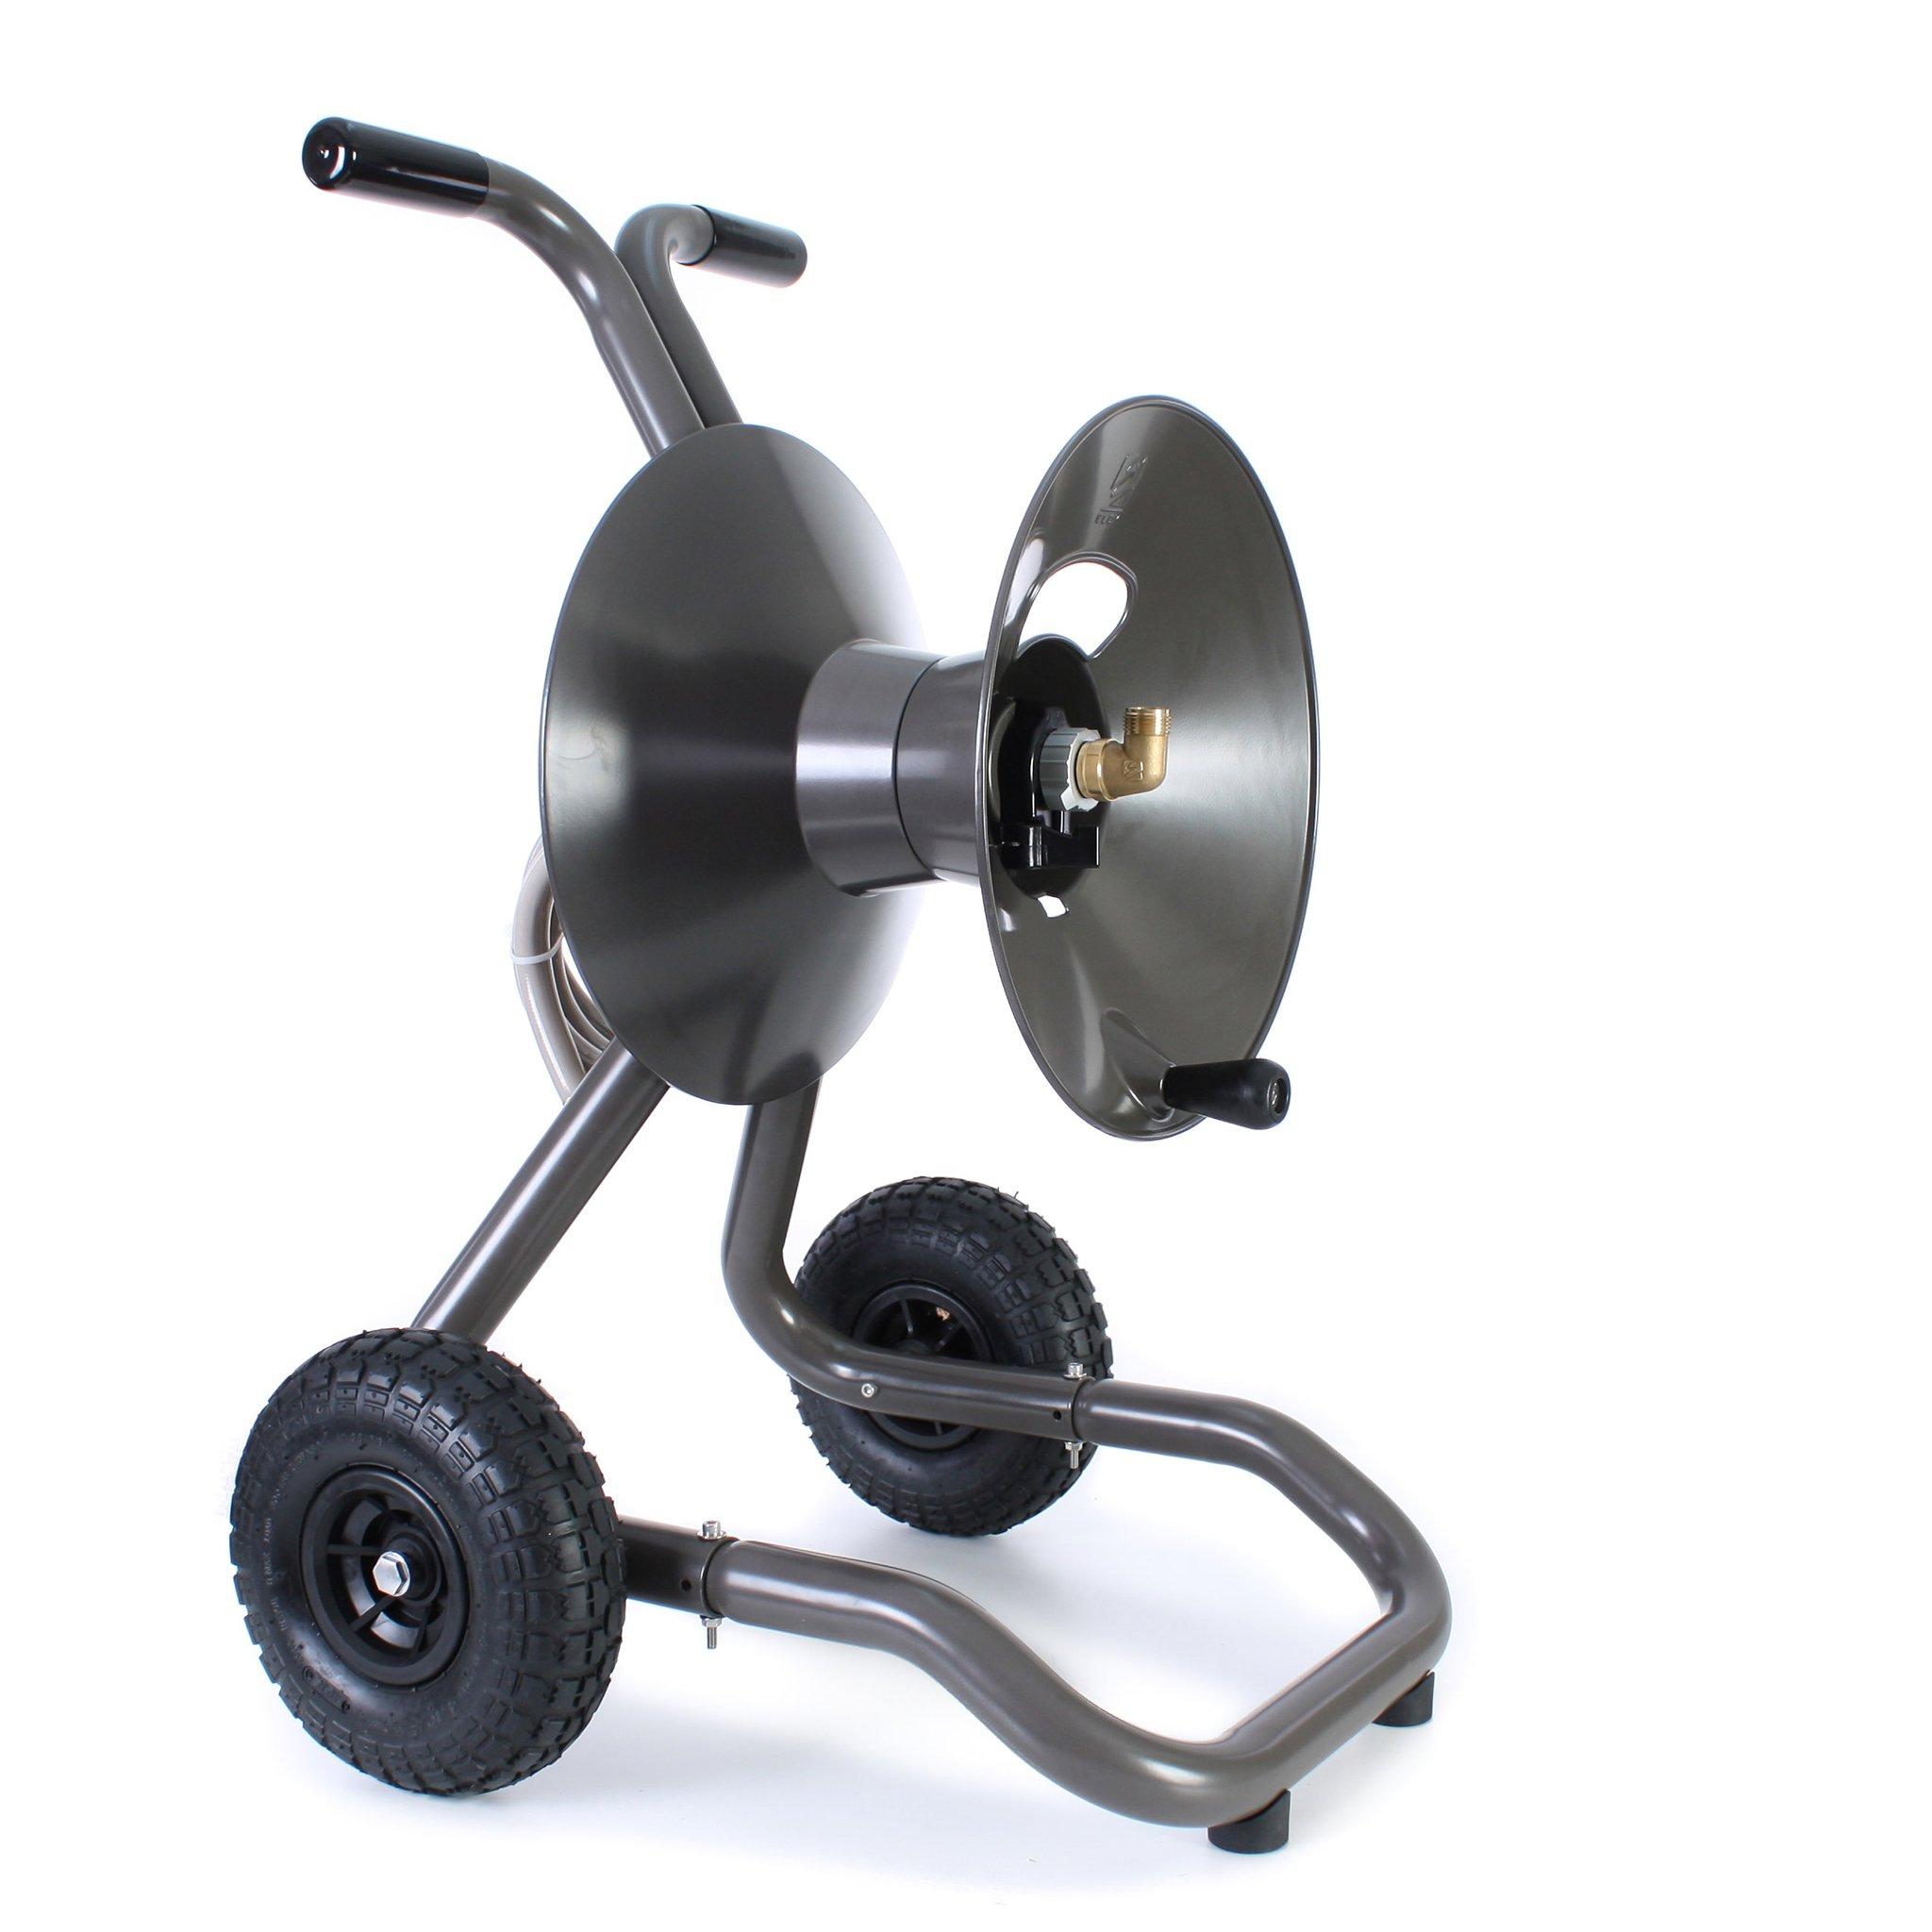 eley-hose-reel-cart  sc 1 st  VitalHoseHQ & 5 Best Hose Reel Cart With Wheels Reviews - VitalHoseHQ.com